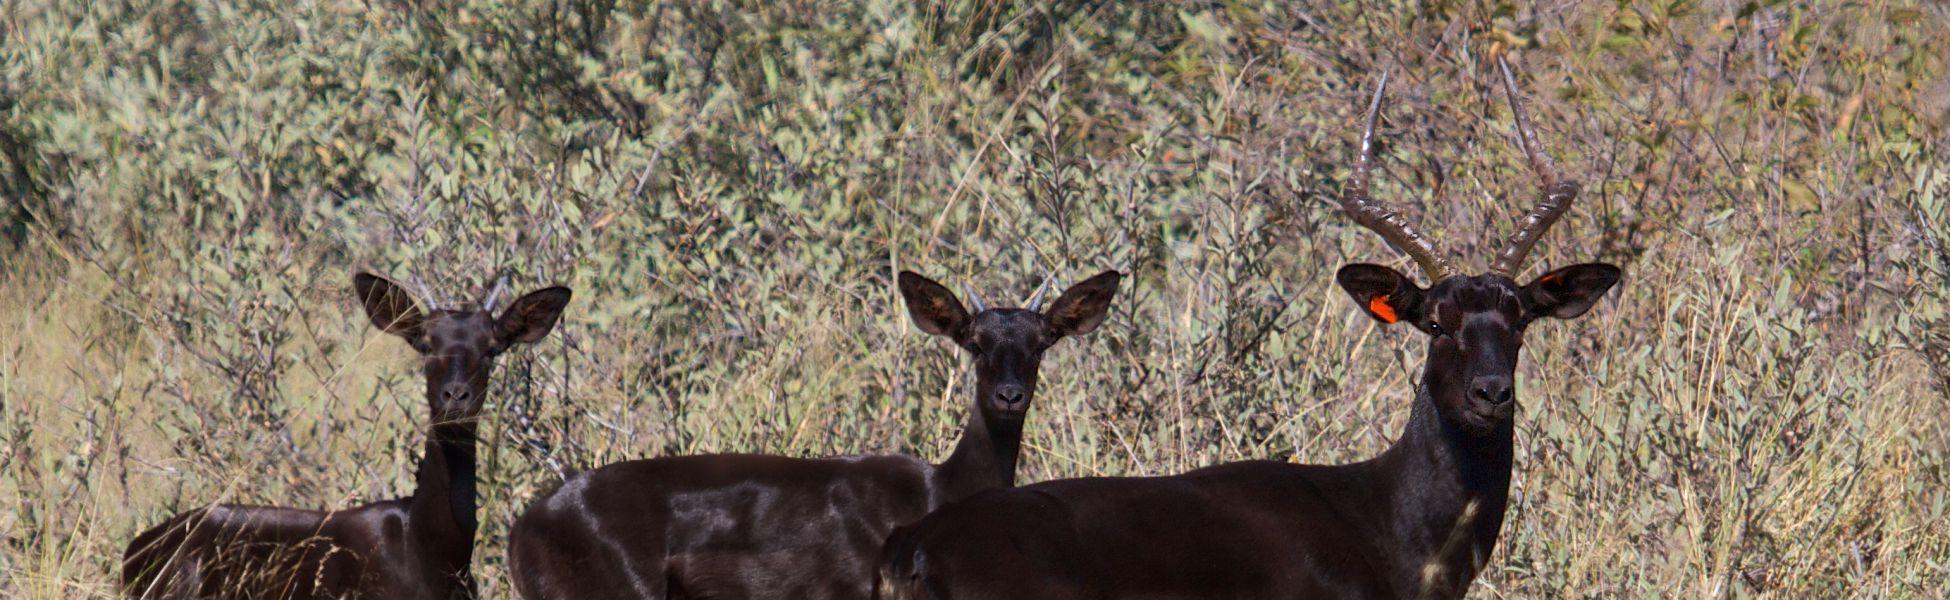 Black Impala Header